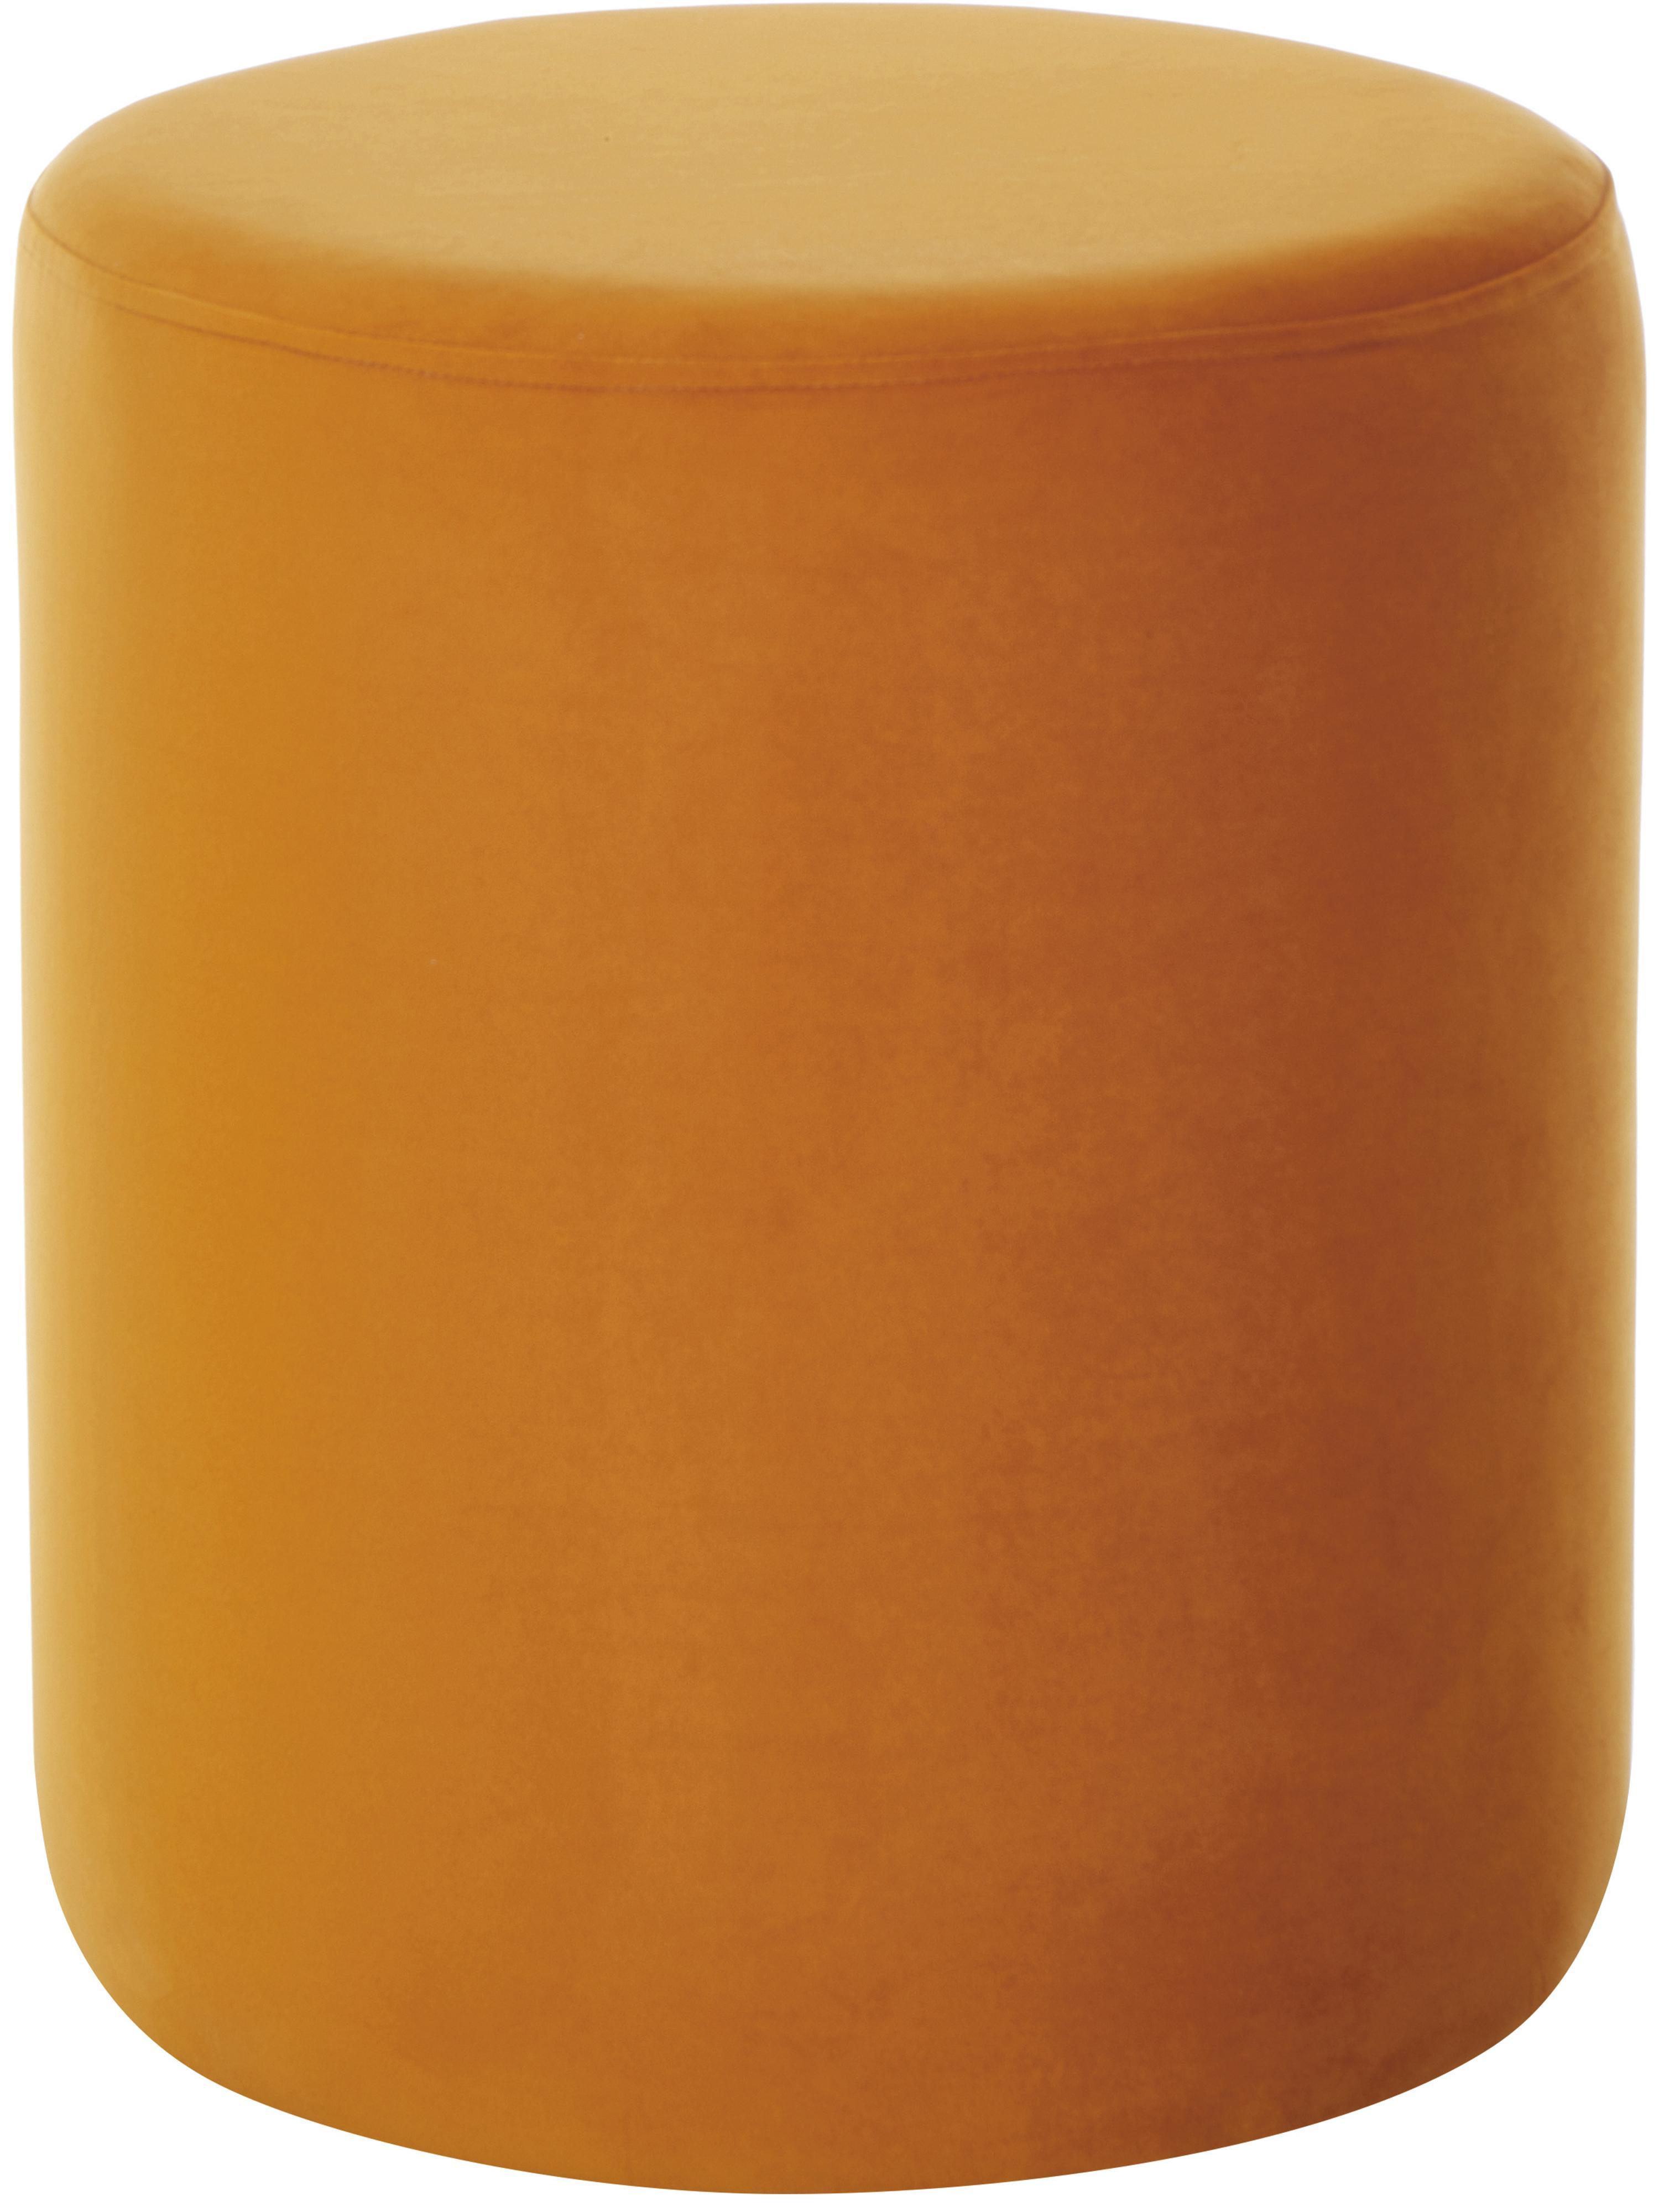 Samt-Hocker Daisy, Bezug: Samt (Polyester) Der hoch, Rahmen: Sperrholz, Samt Terrakotta, Ø 38 x H 45 cm